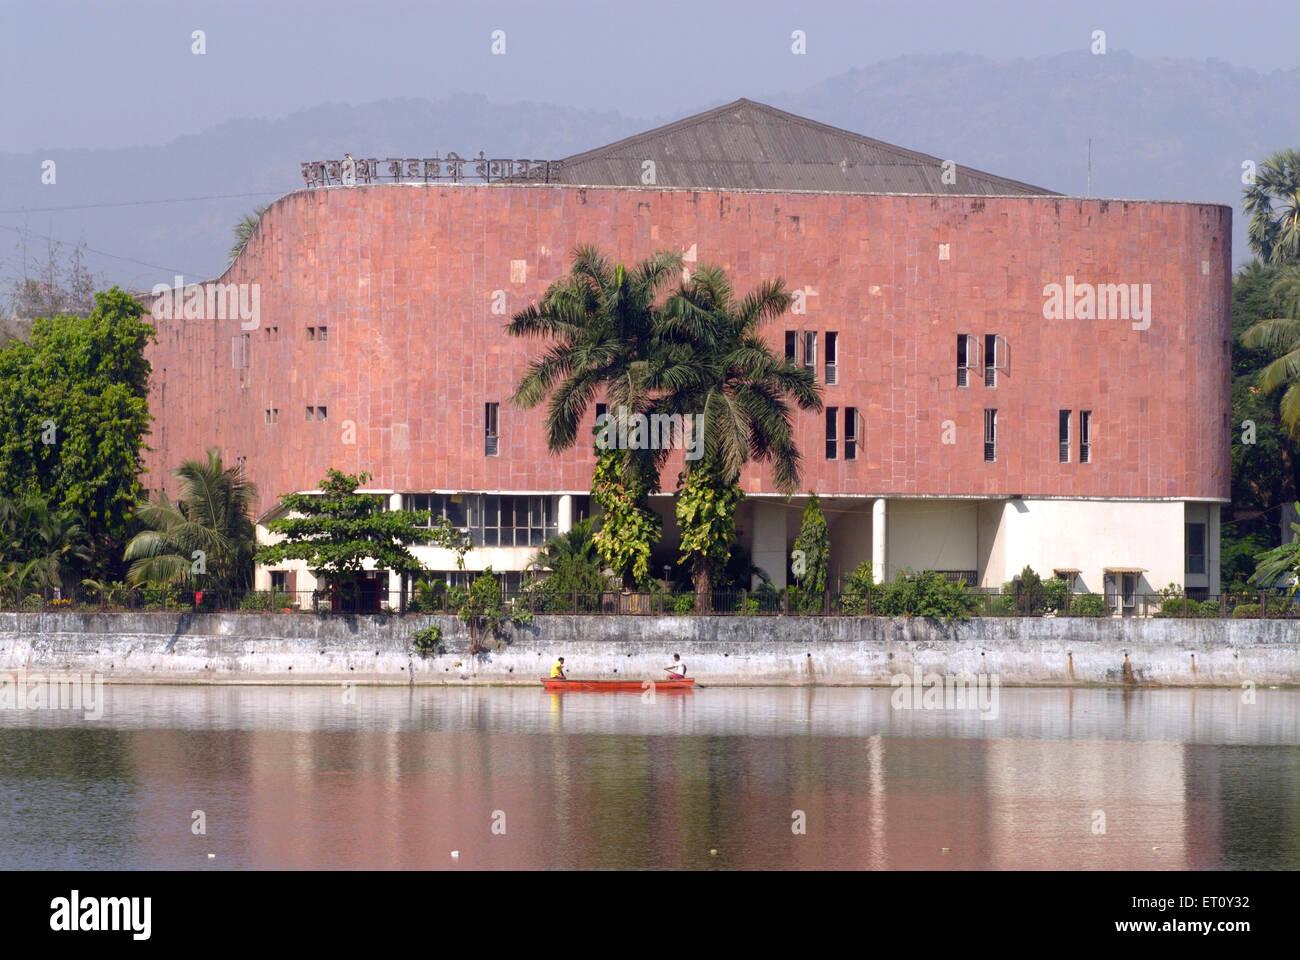 Ram Ganesh Gadkari Rangayatan Marathi drama theatre reflection in water of Masunda lake or Talao Pali ; Thane - Stock Image